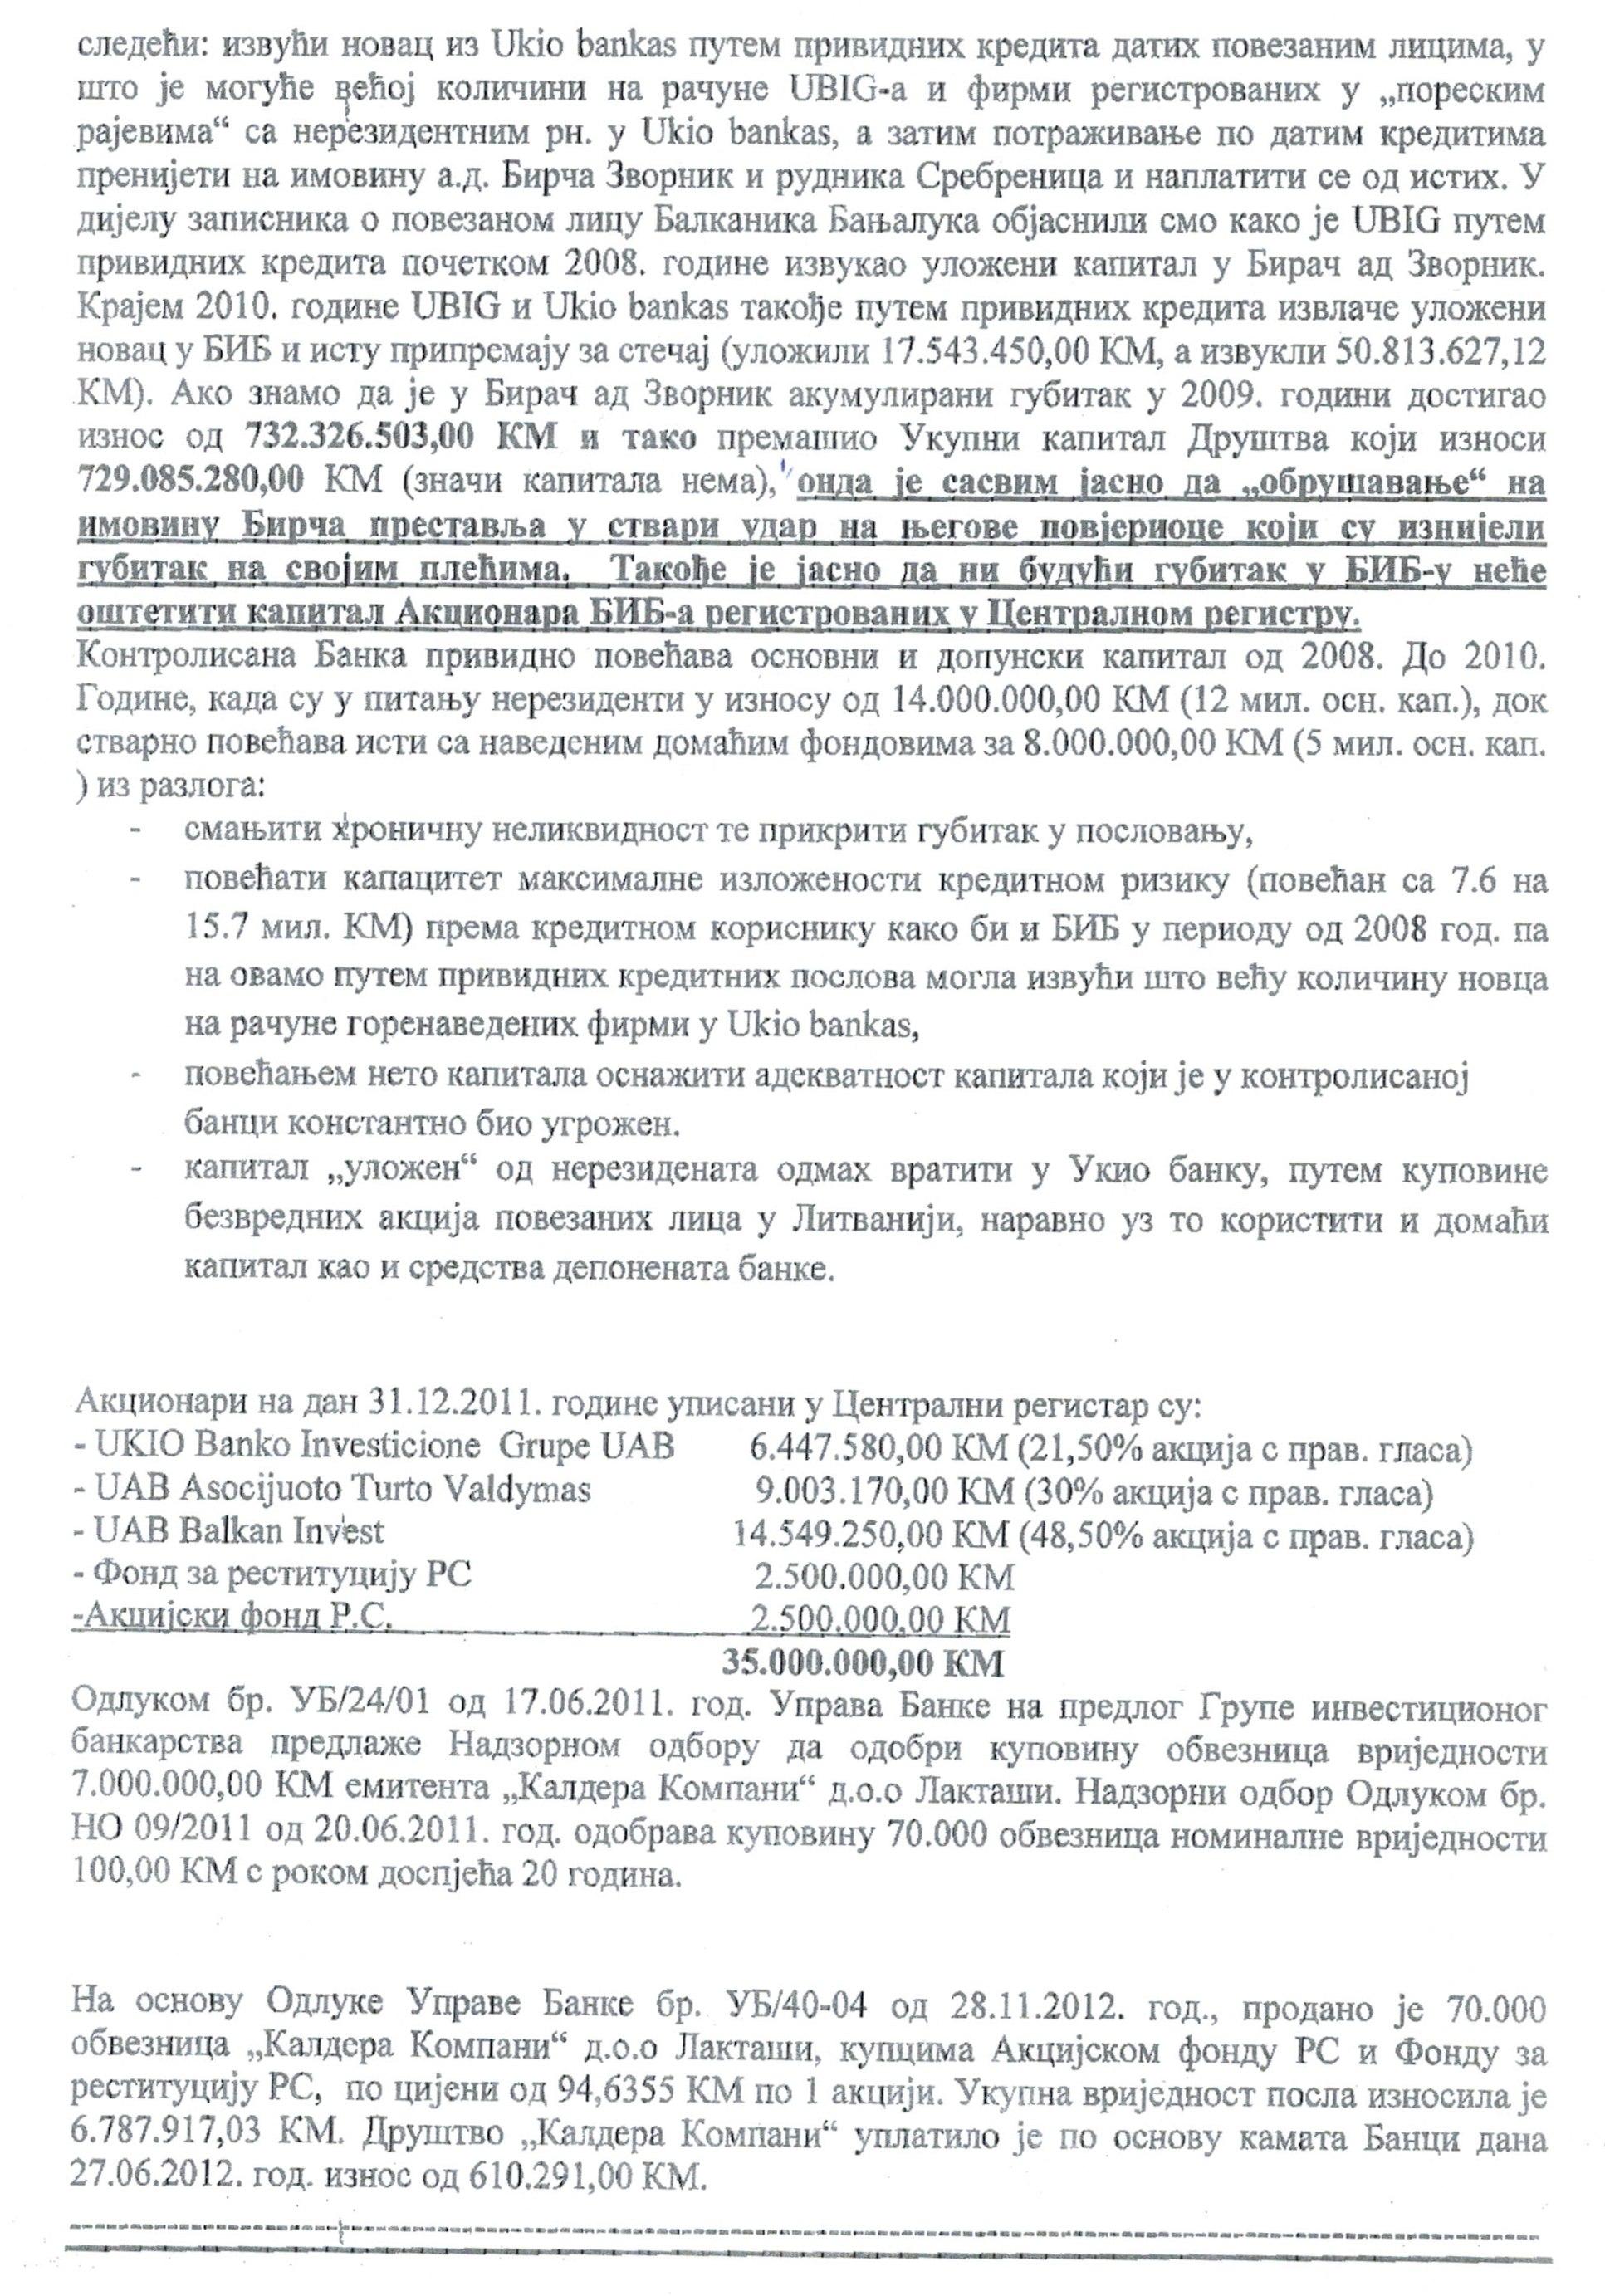 CCF12016_0000